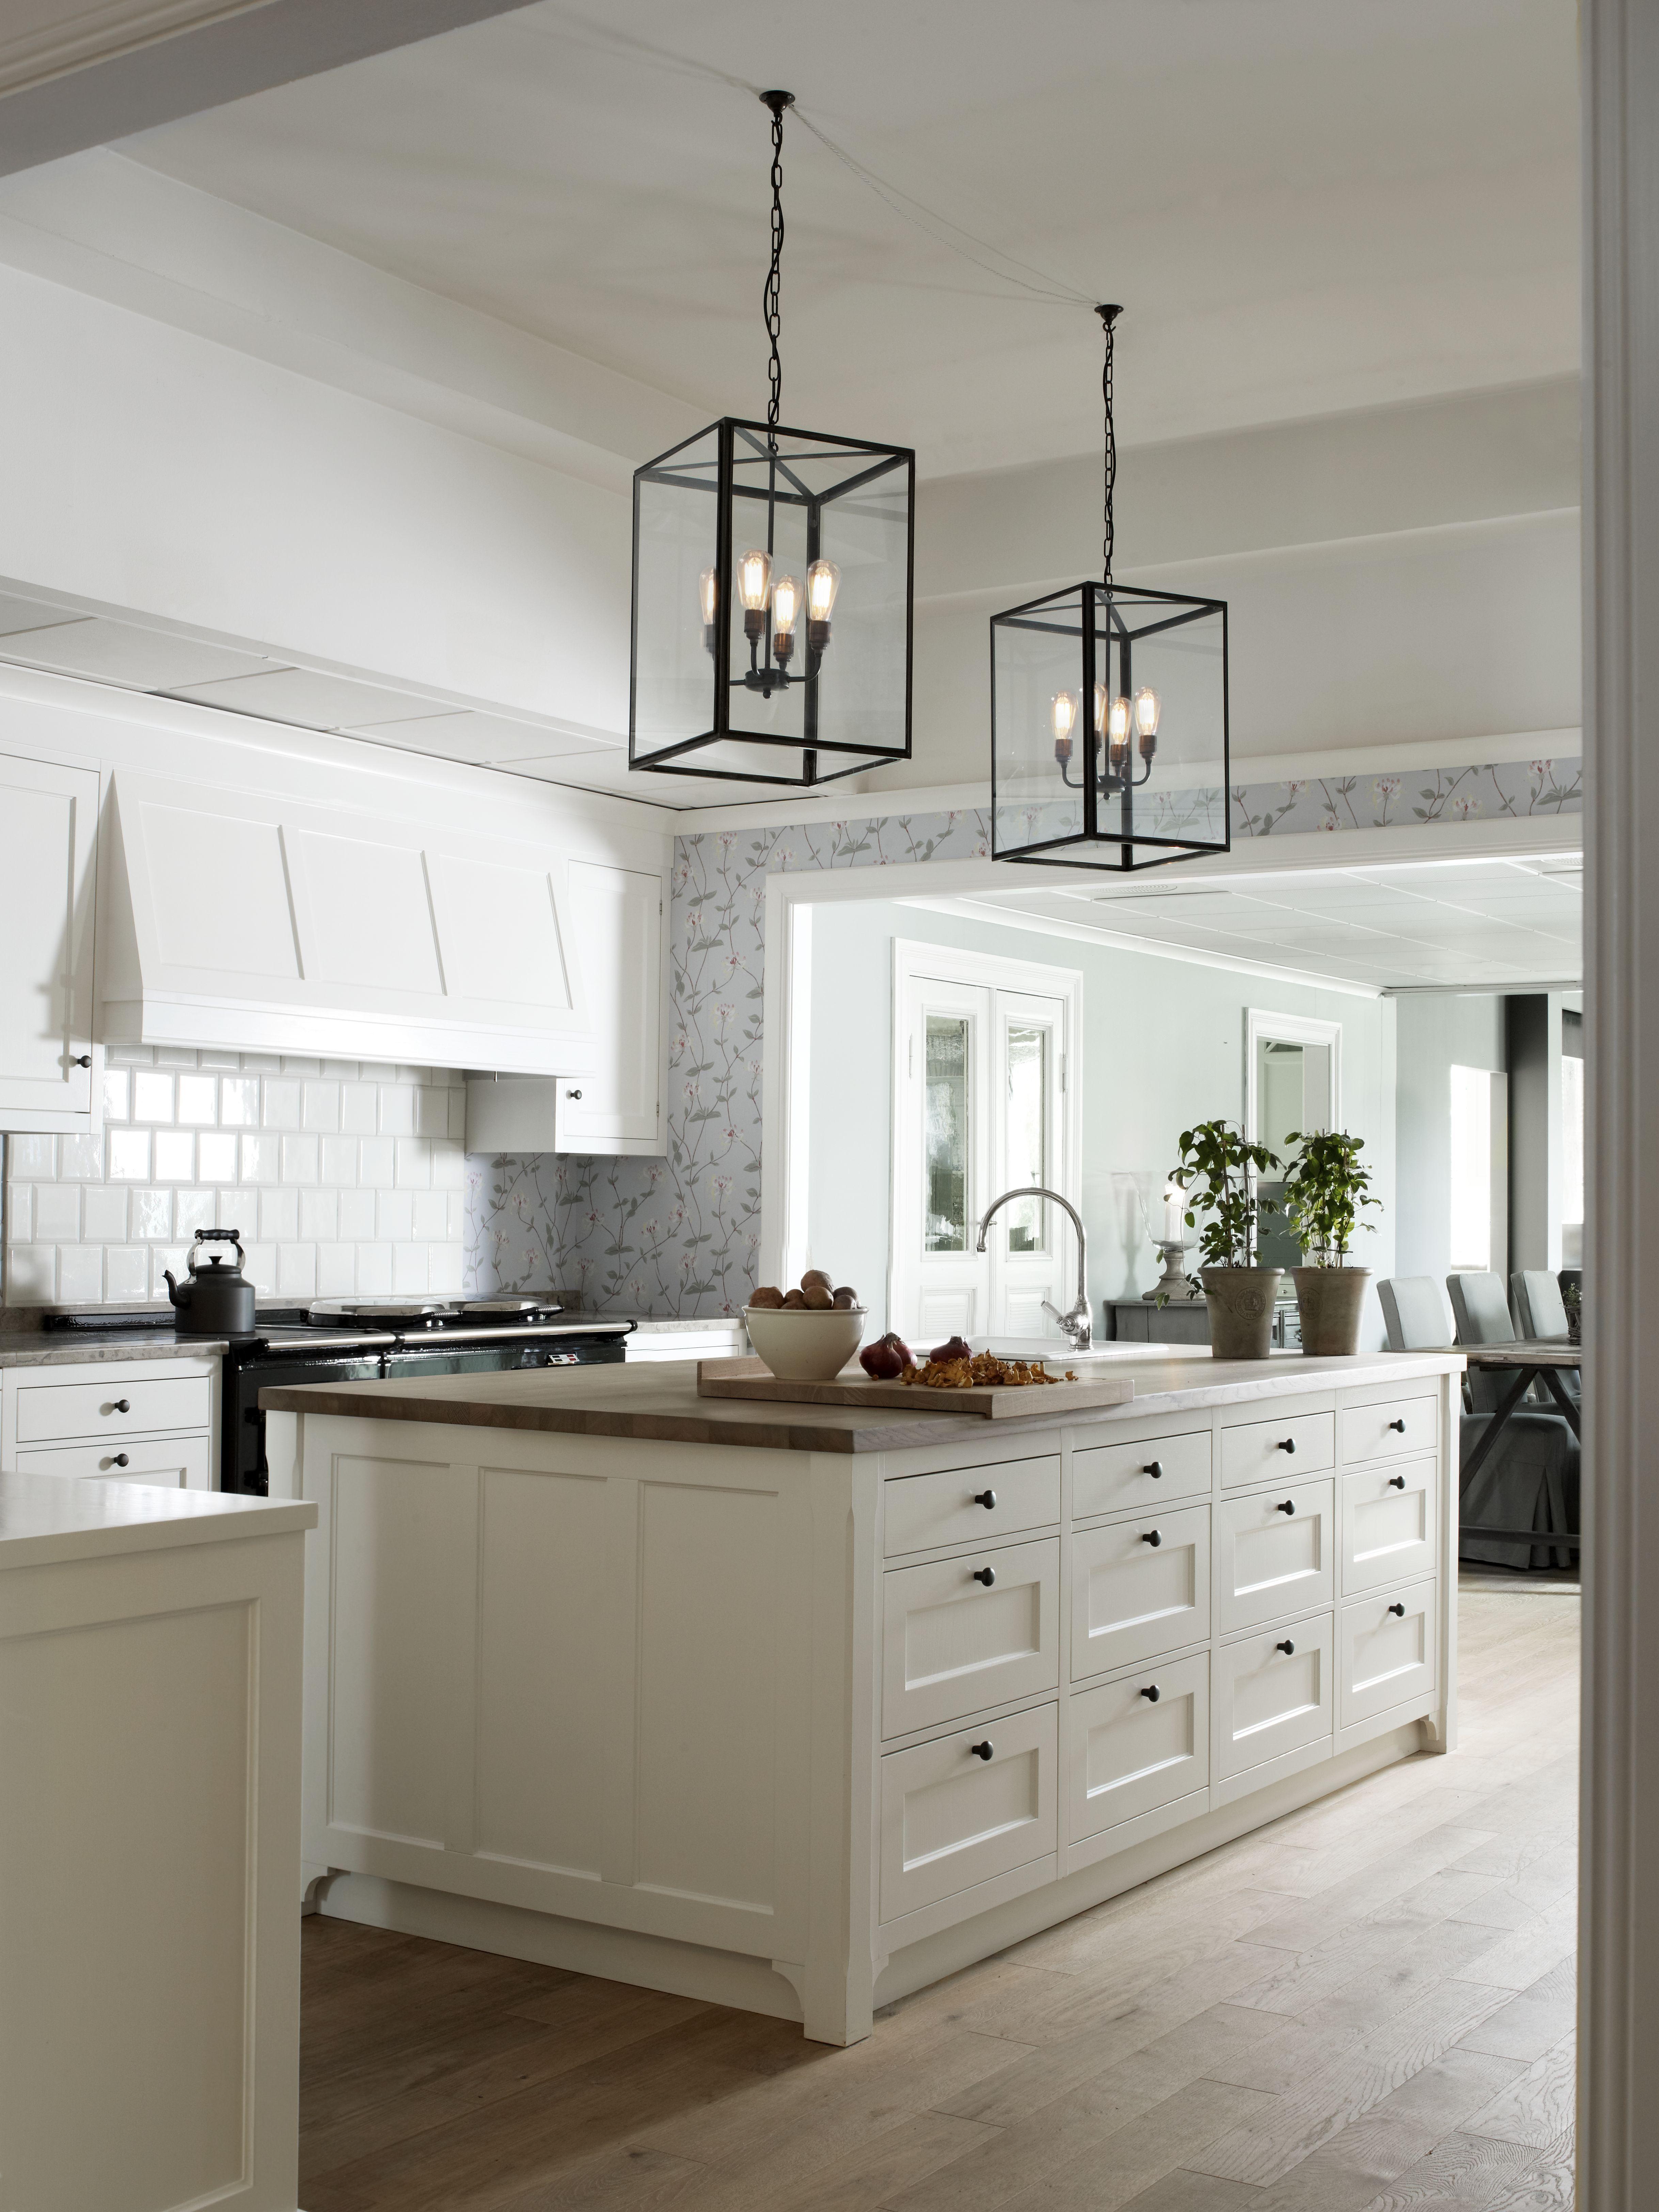 kitchen lights and layout kitchen pinterest moderner landhausstil arbeitsplatte und. Black Bedroom Furniture Sets. Home Design Ideas